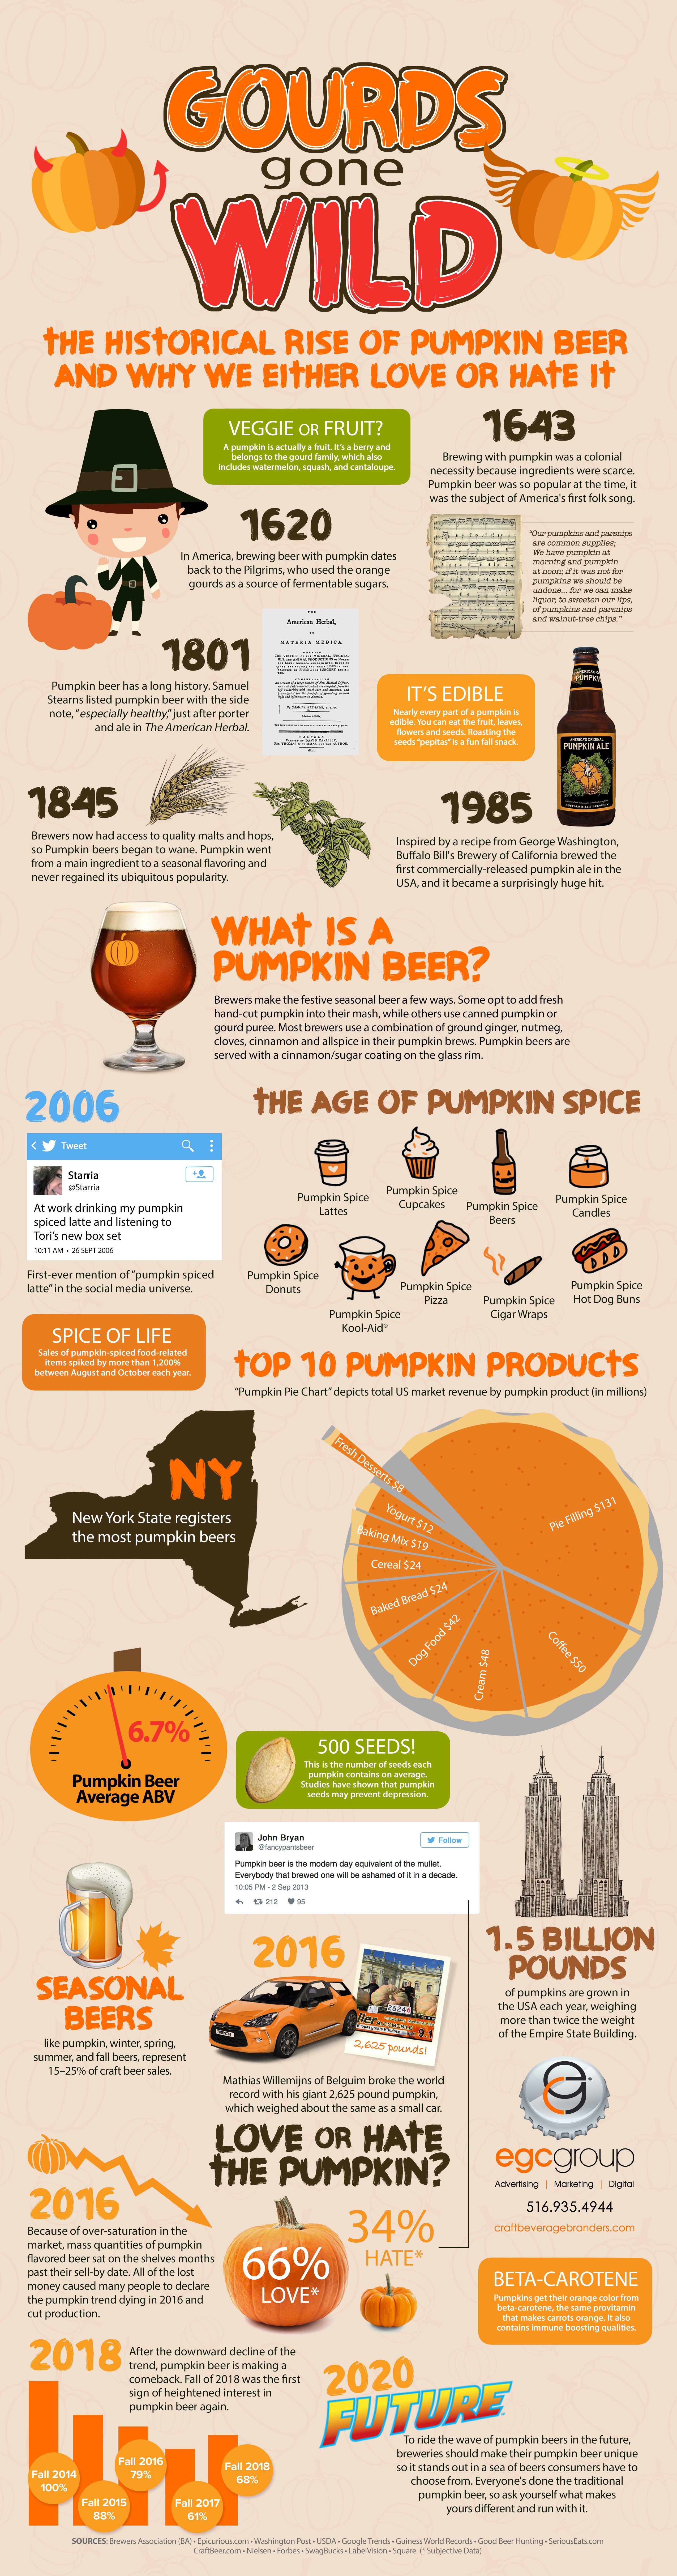 PumkinBeer_Infographic_19